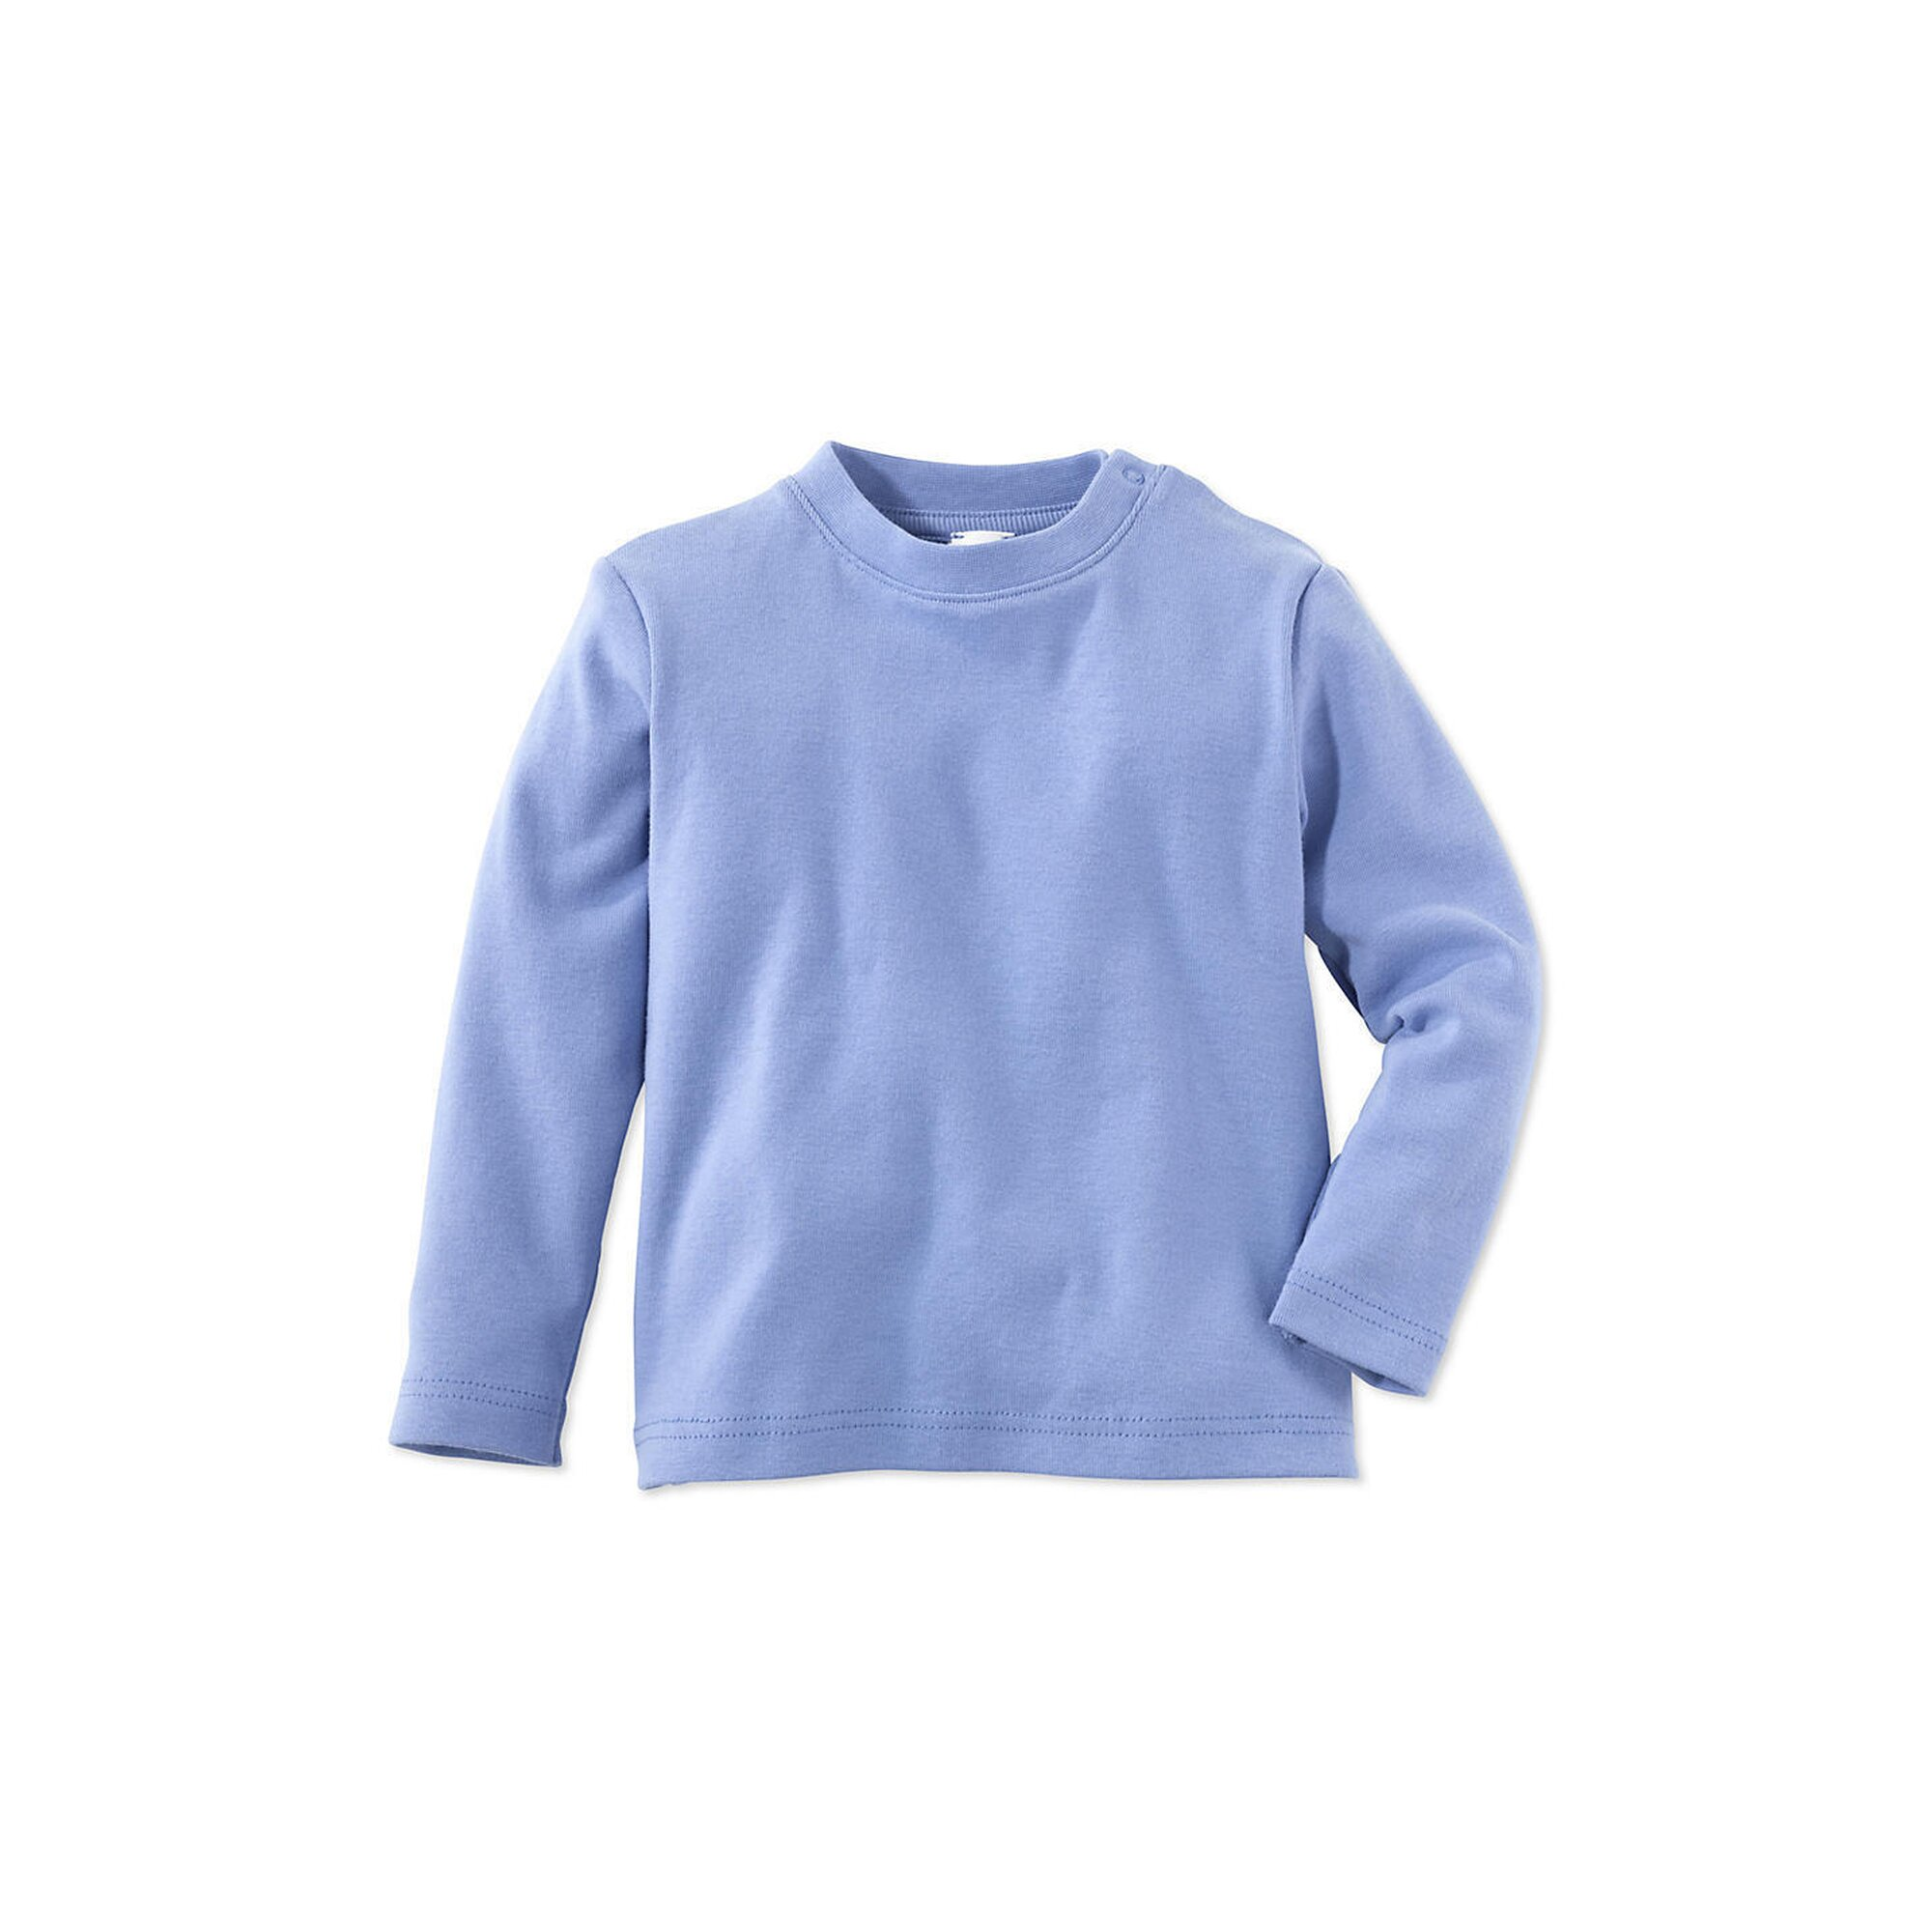 Hessnatur Basic Langarmshirt aus reiner Bio-Baumwolle